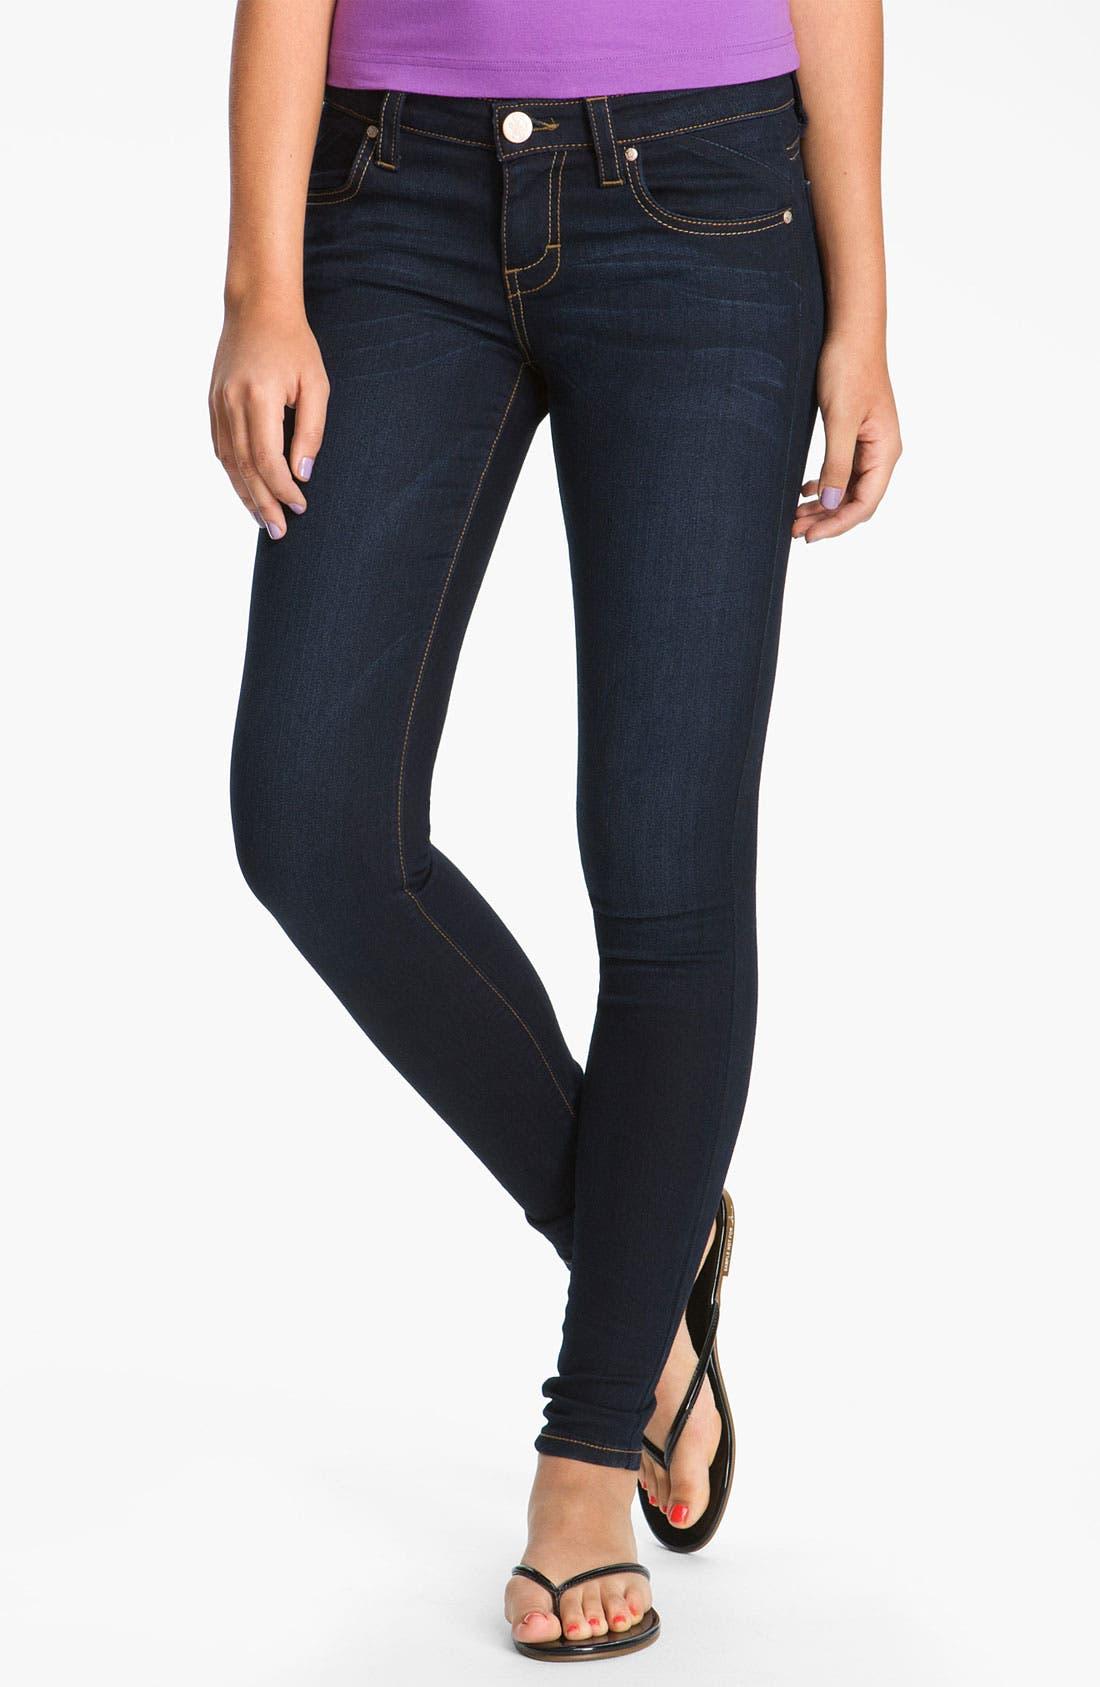 Main Image - STS Blue Skinny Jeans (Brisbane Dark) (Juniors) (Online Only)